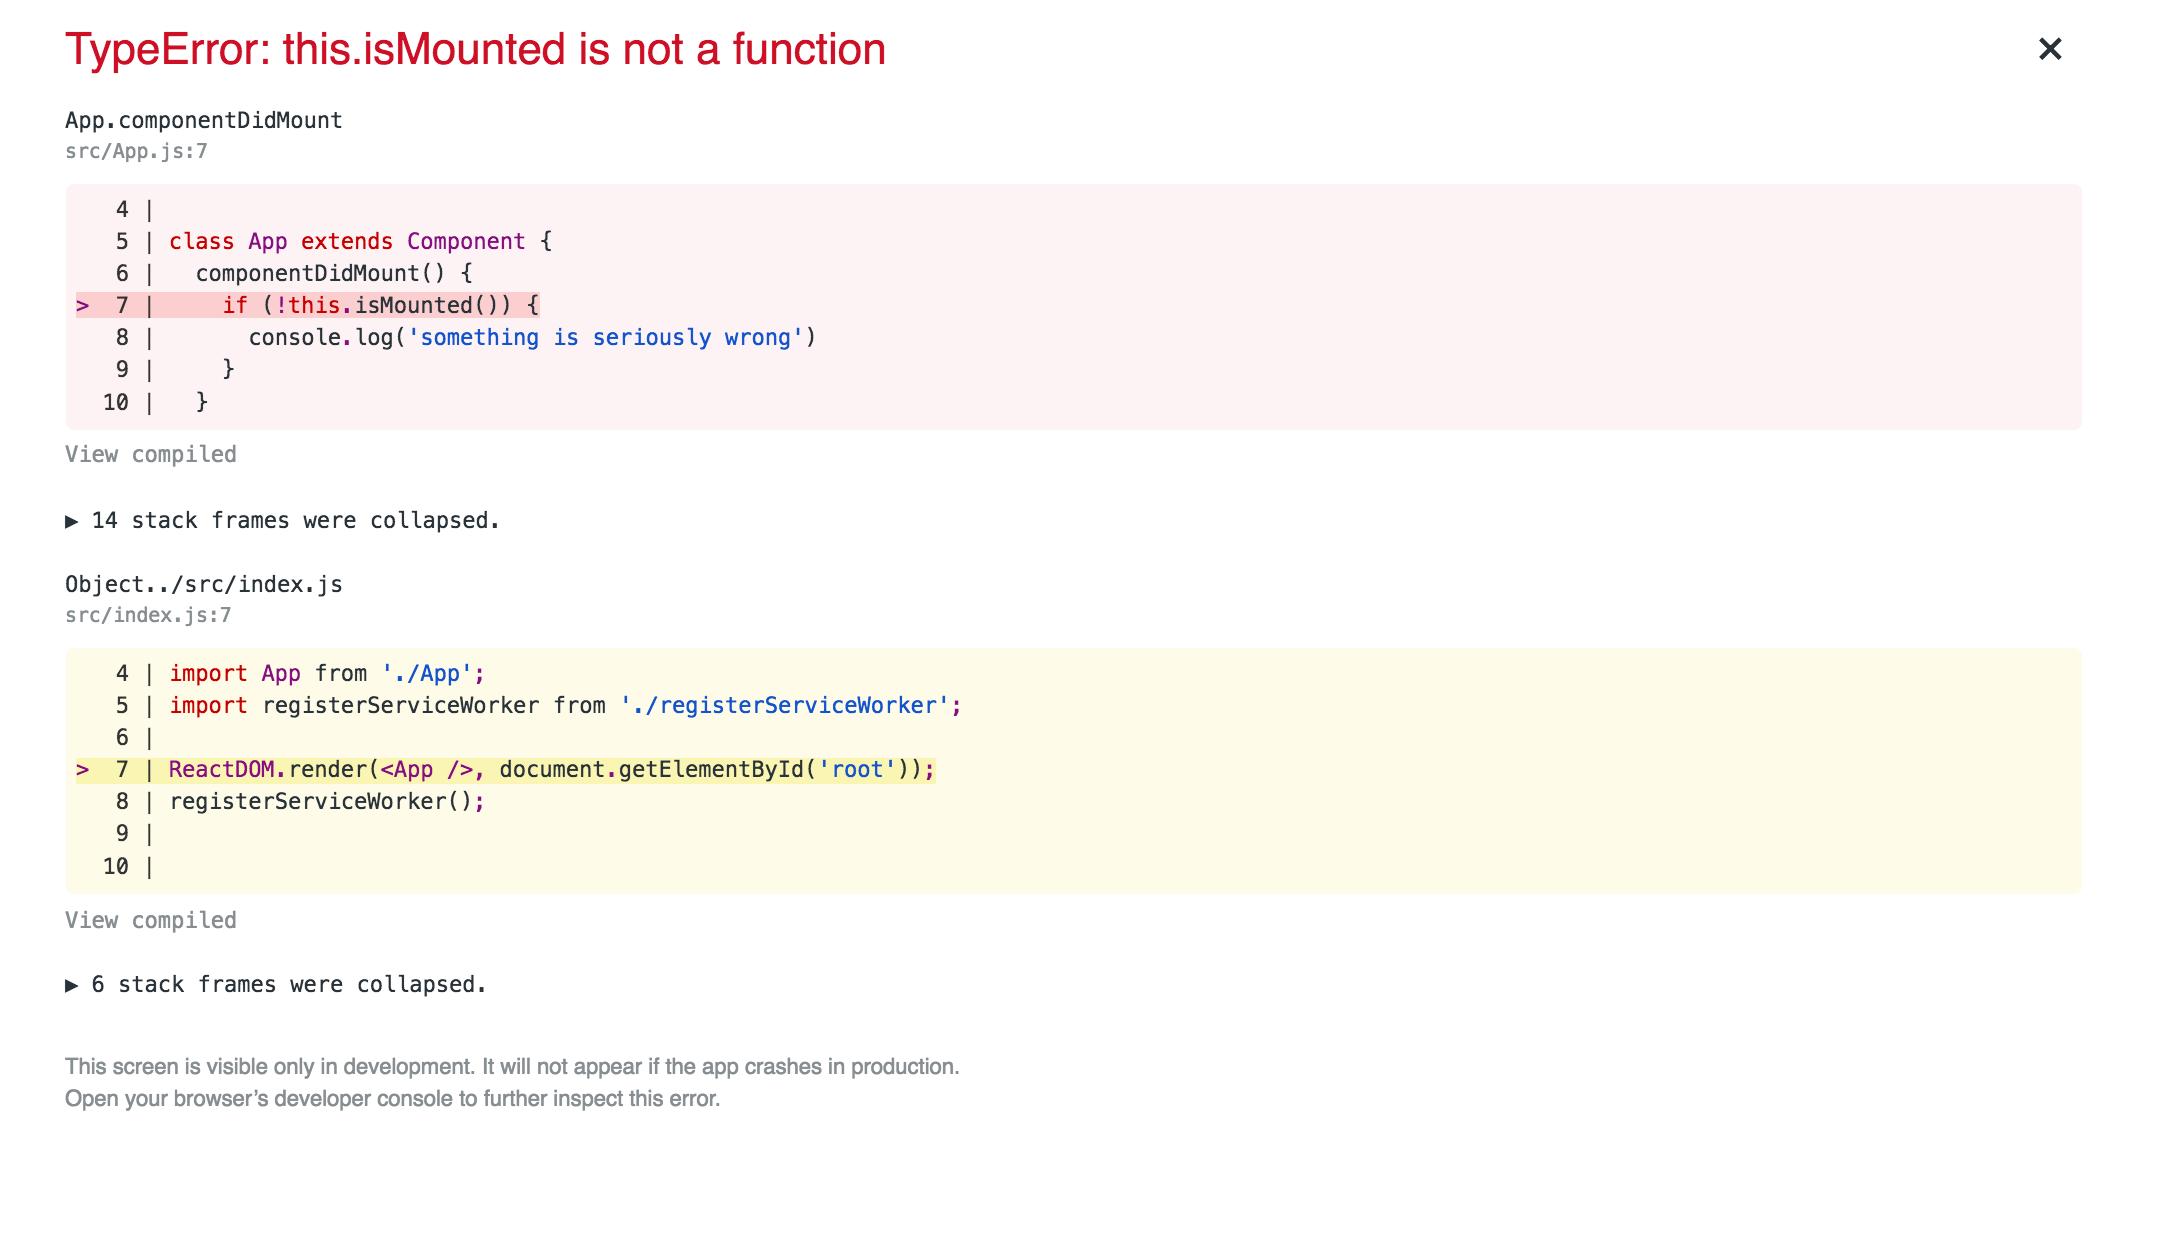 screenshot showing error overlay